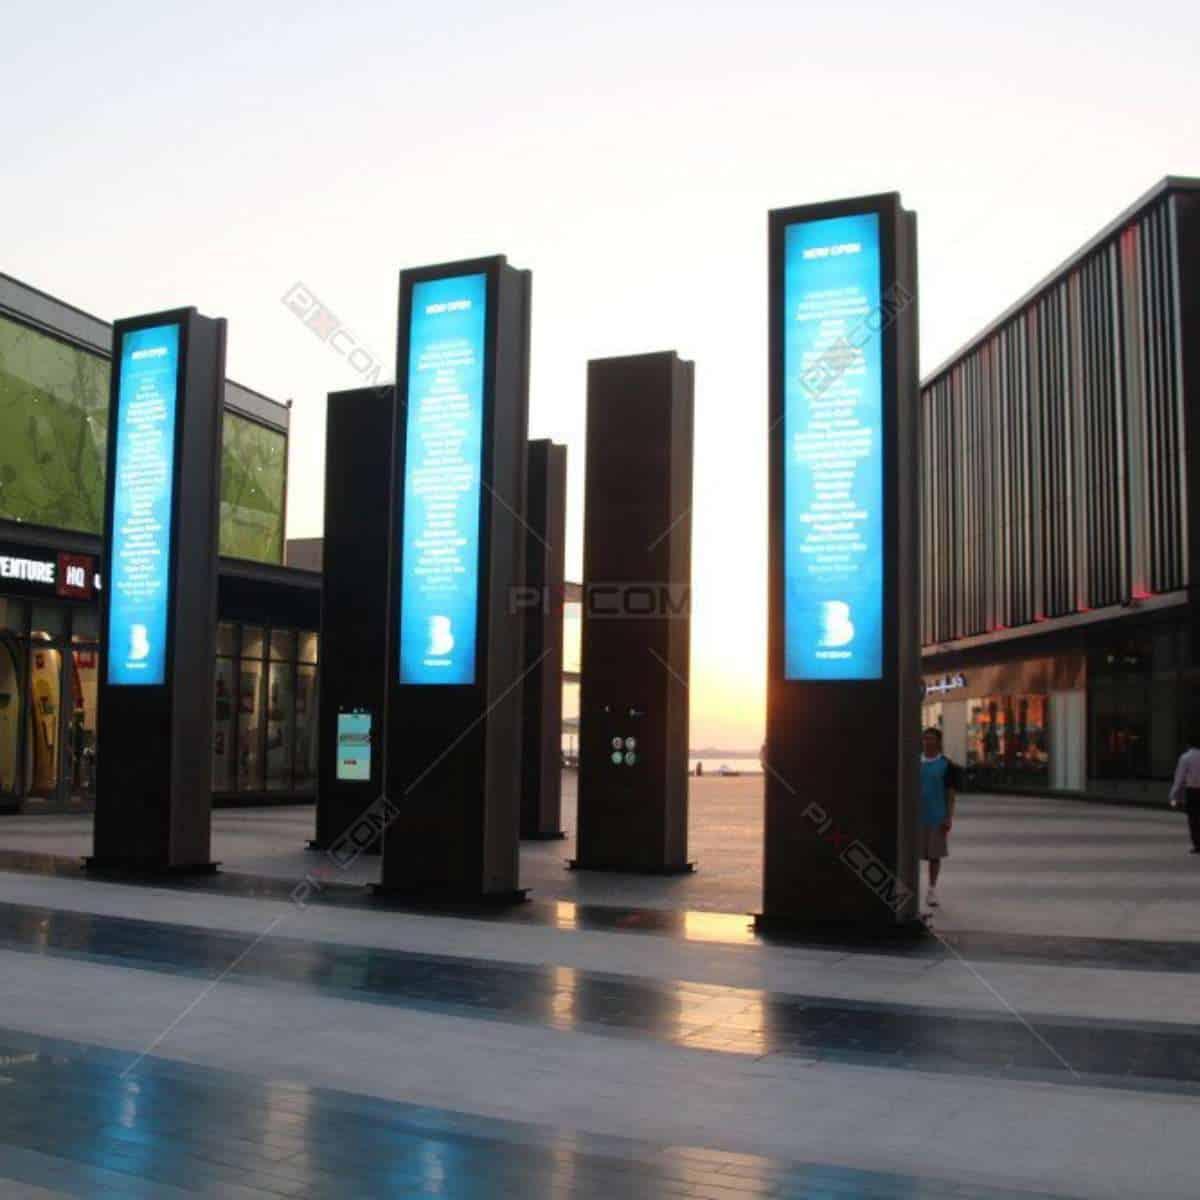 Kiosk System Providers